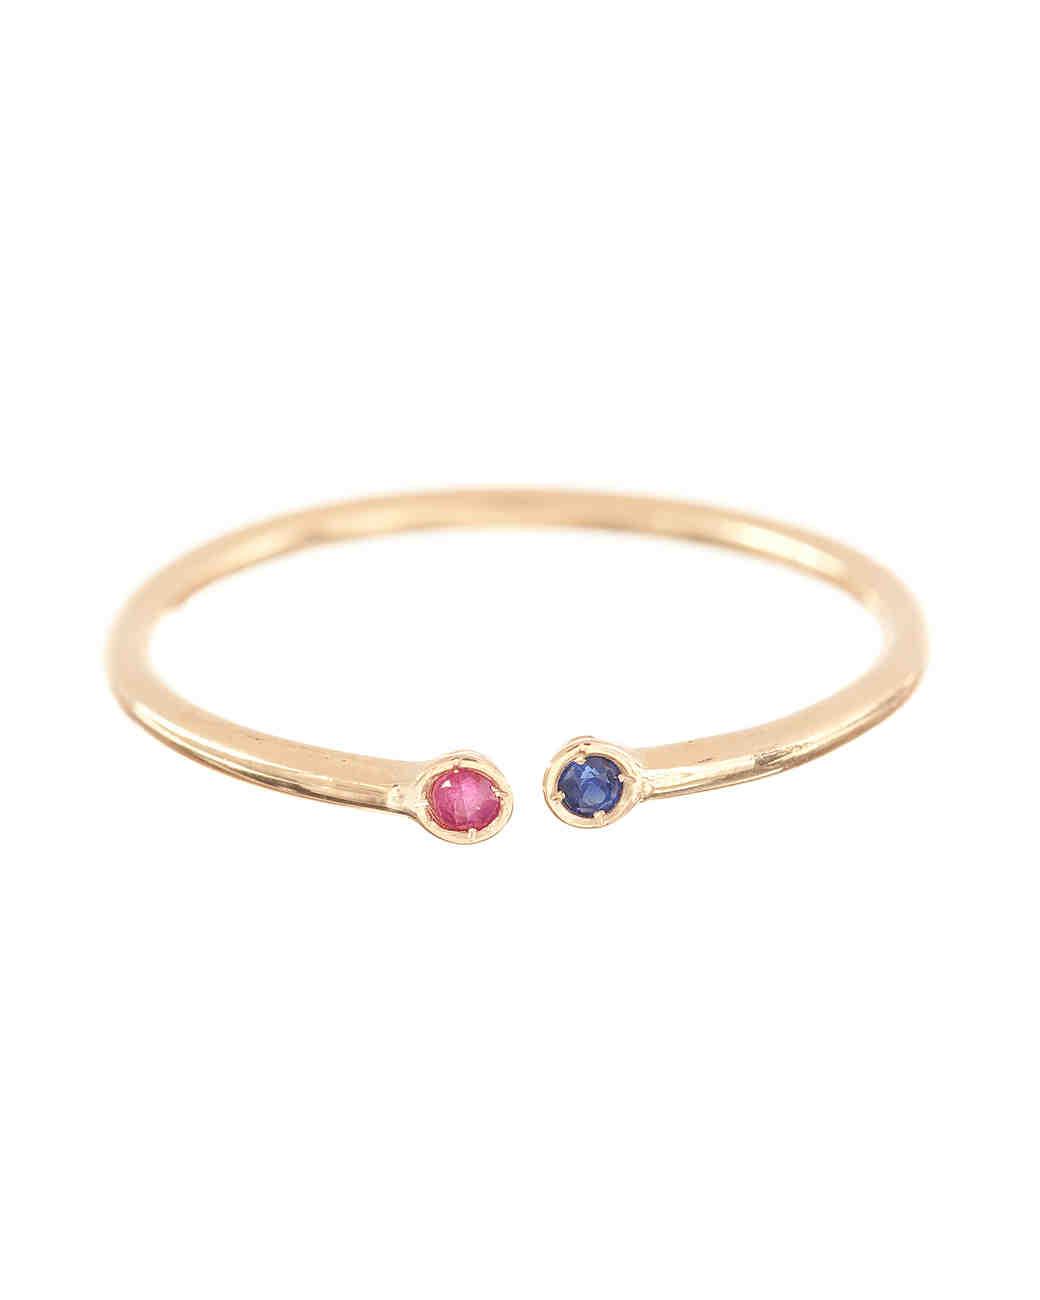 mother-bride-groom-gift-ariel-gordon-birthstone-ring-0415.jpg